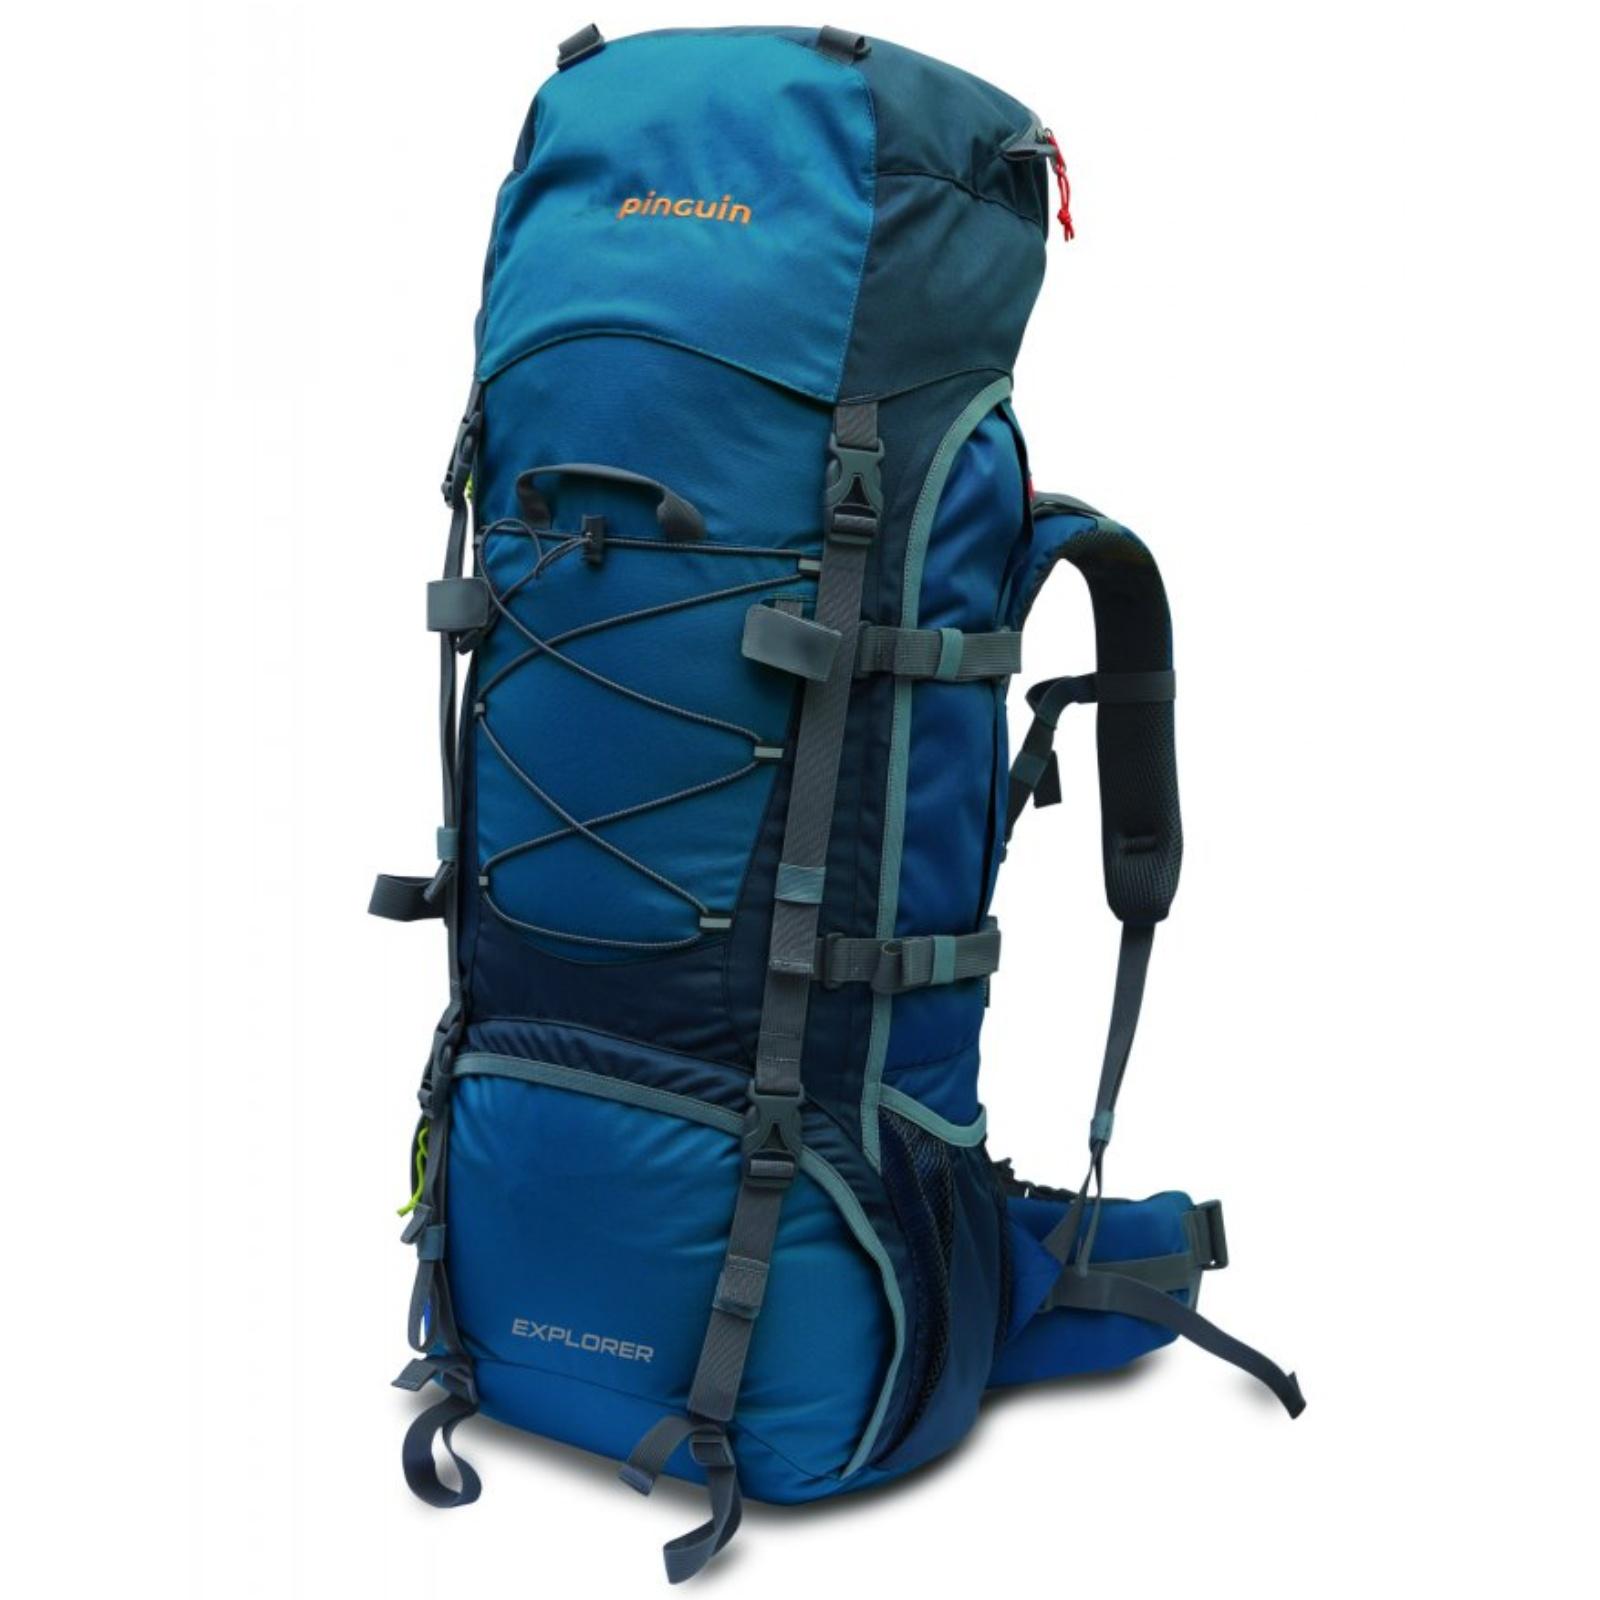 Batoh PINGUIN Explorer 75 modrý